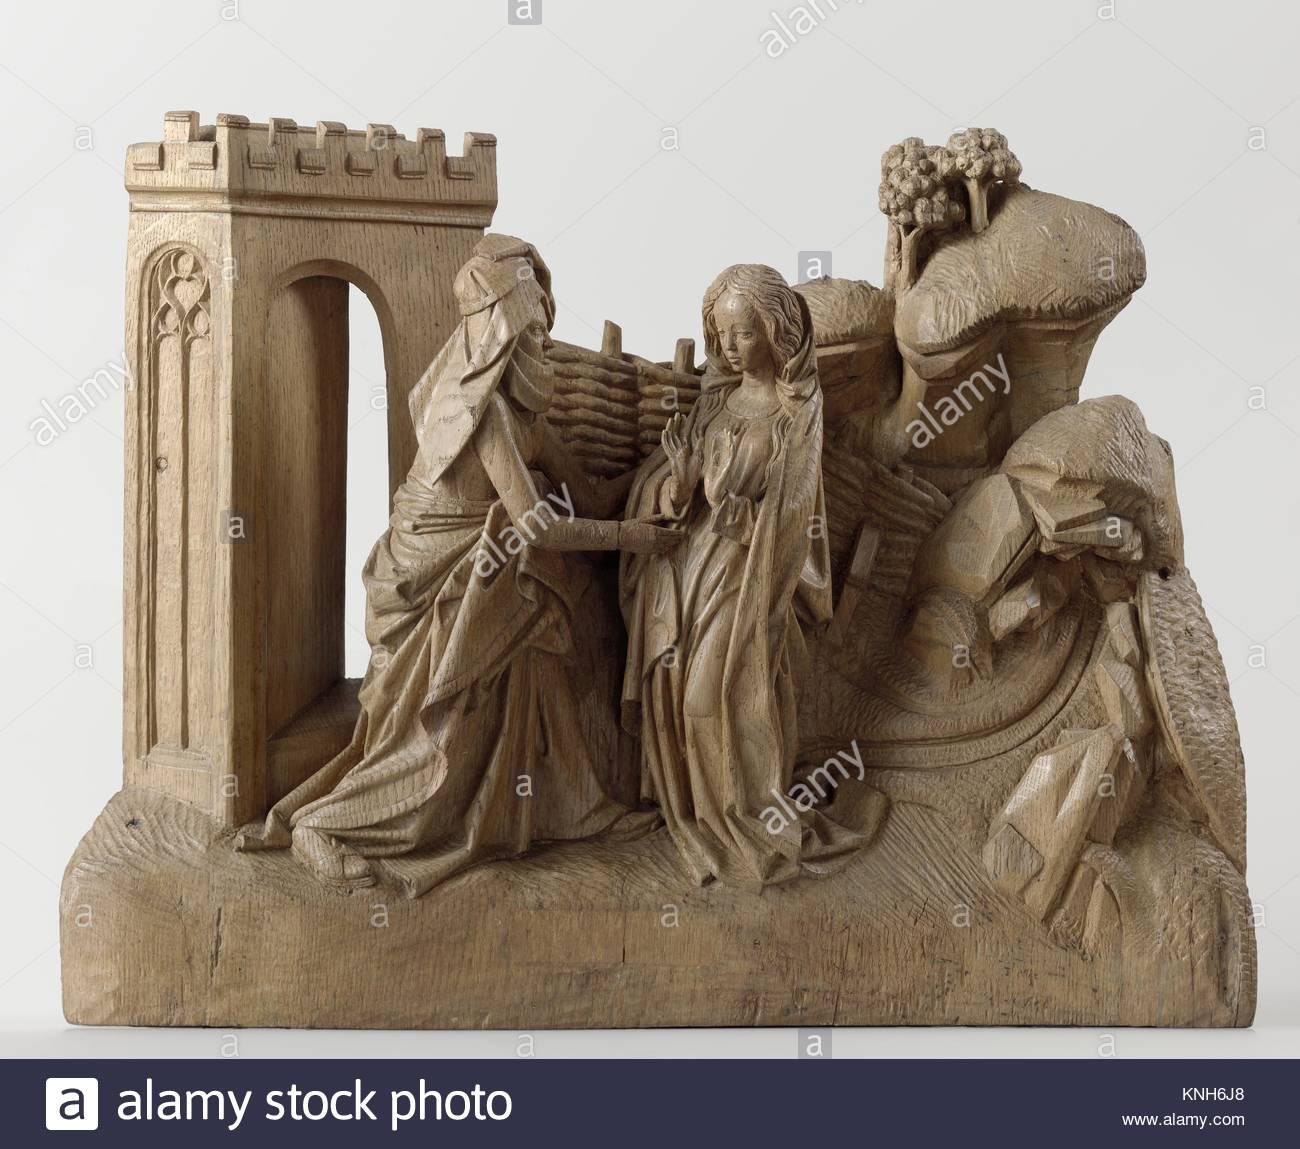 The Visitation, Adriaen van Wesel, c. 1475 - c. 1477 - Stock Image